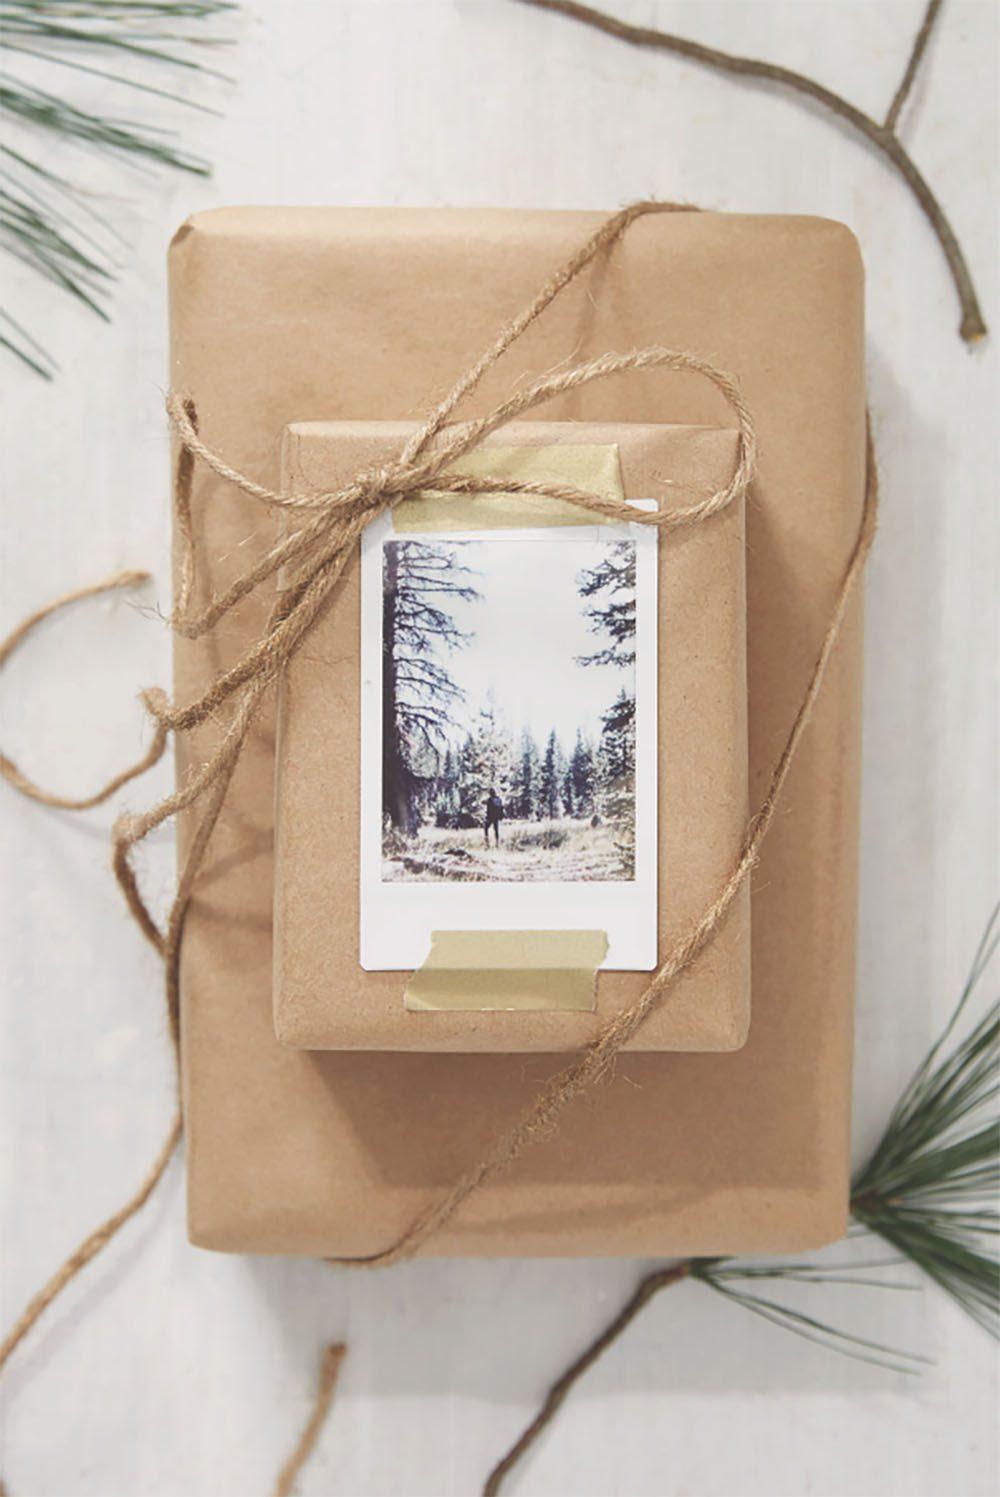 jillian-harris-how-to-wrap-the-perfect-present-4